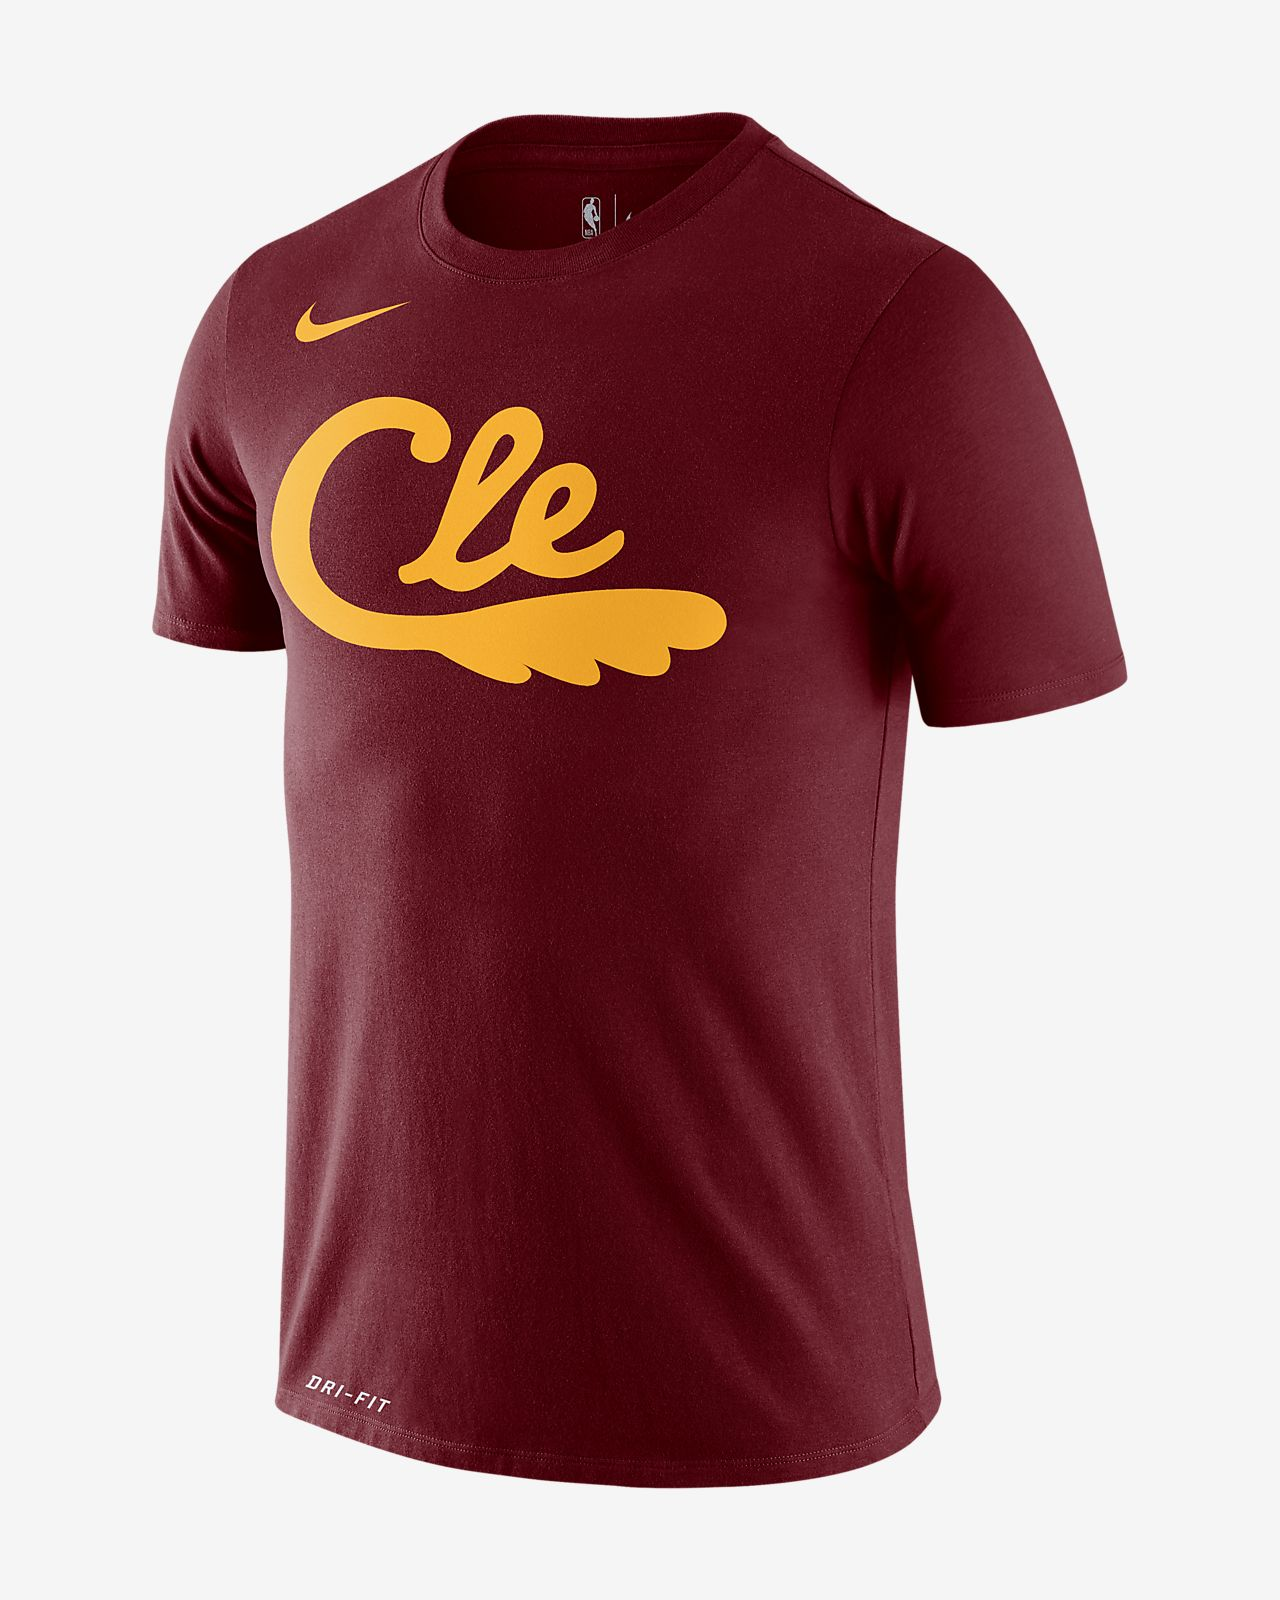 Cavaliers City Edition Logo Men's Nike Dri-FIT NBA T-Shirt